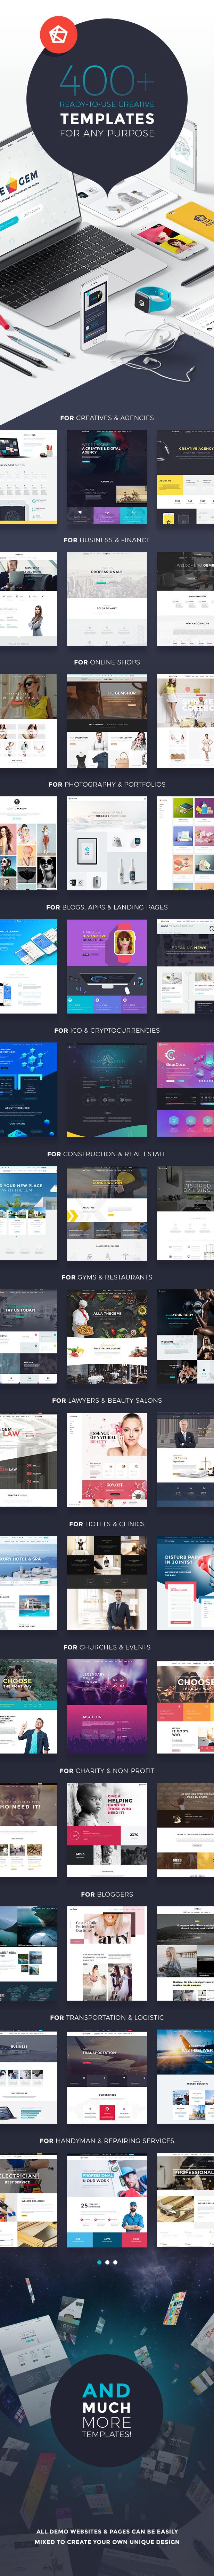 TheGem - Creative Multi-Purpose High-Performance WordPress Theme - 2